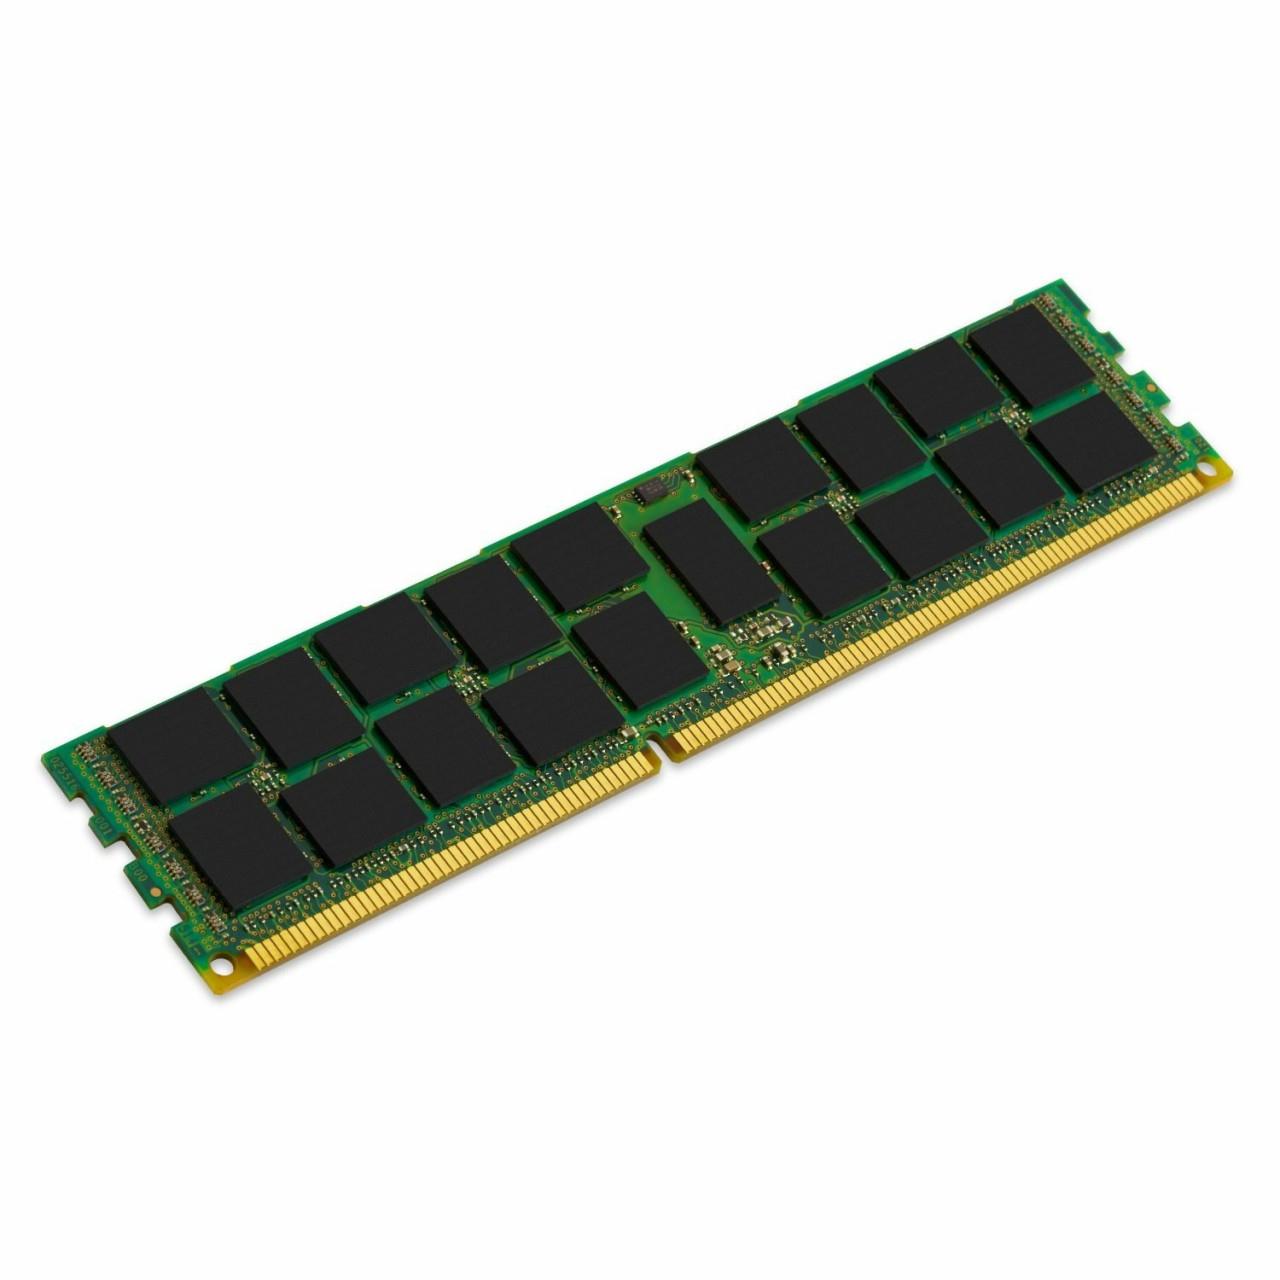 Kingston Technology System Specific Memory 16GB DDR3L 1600MHz Reg ECC 16GB DDR3 1600MHz ECC memory module